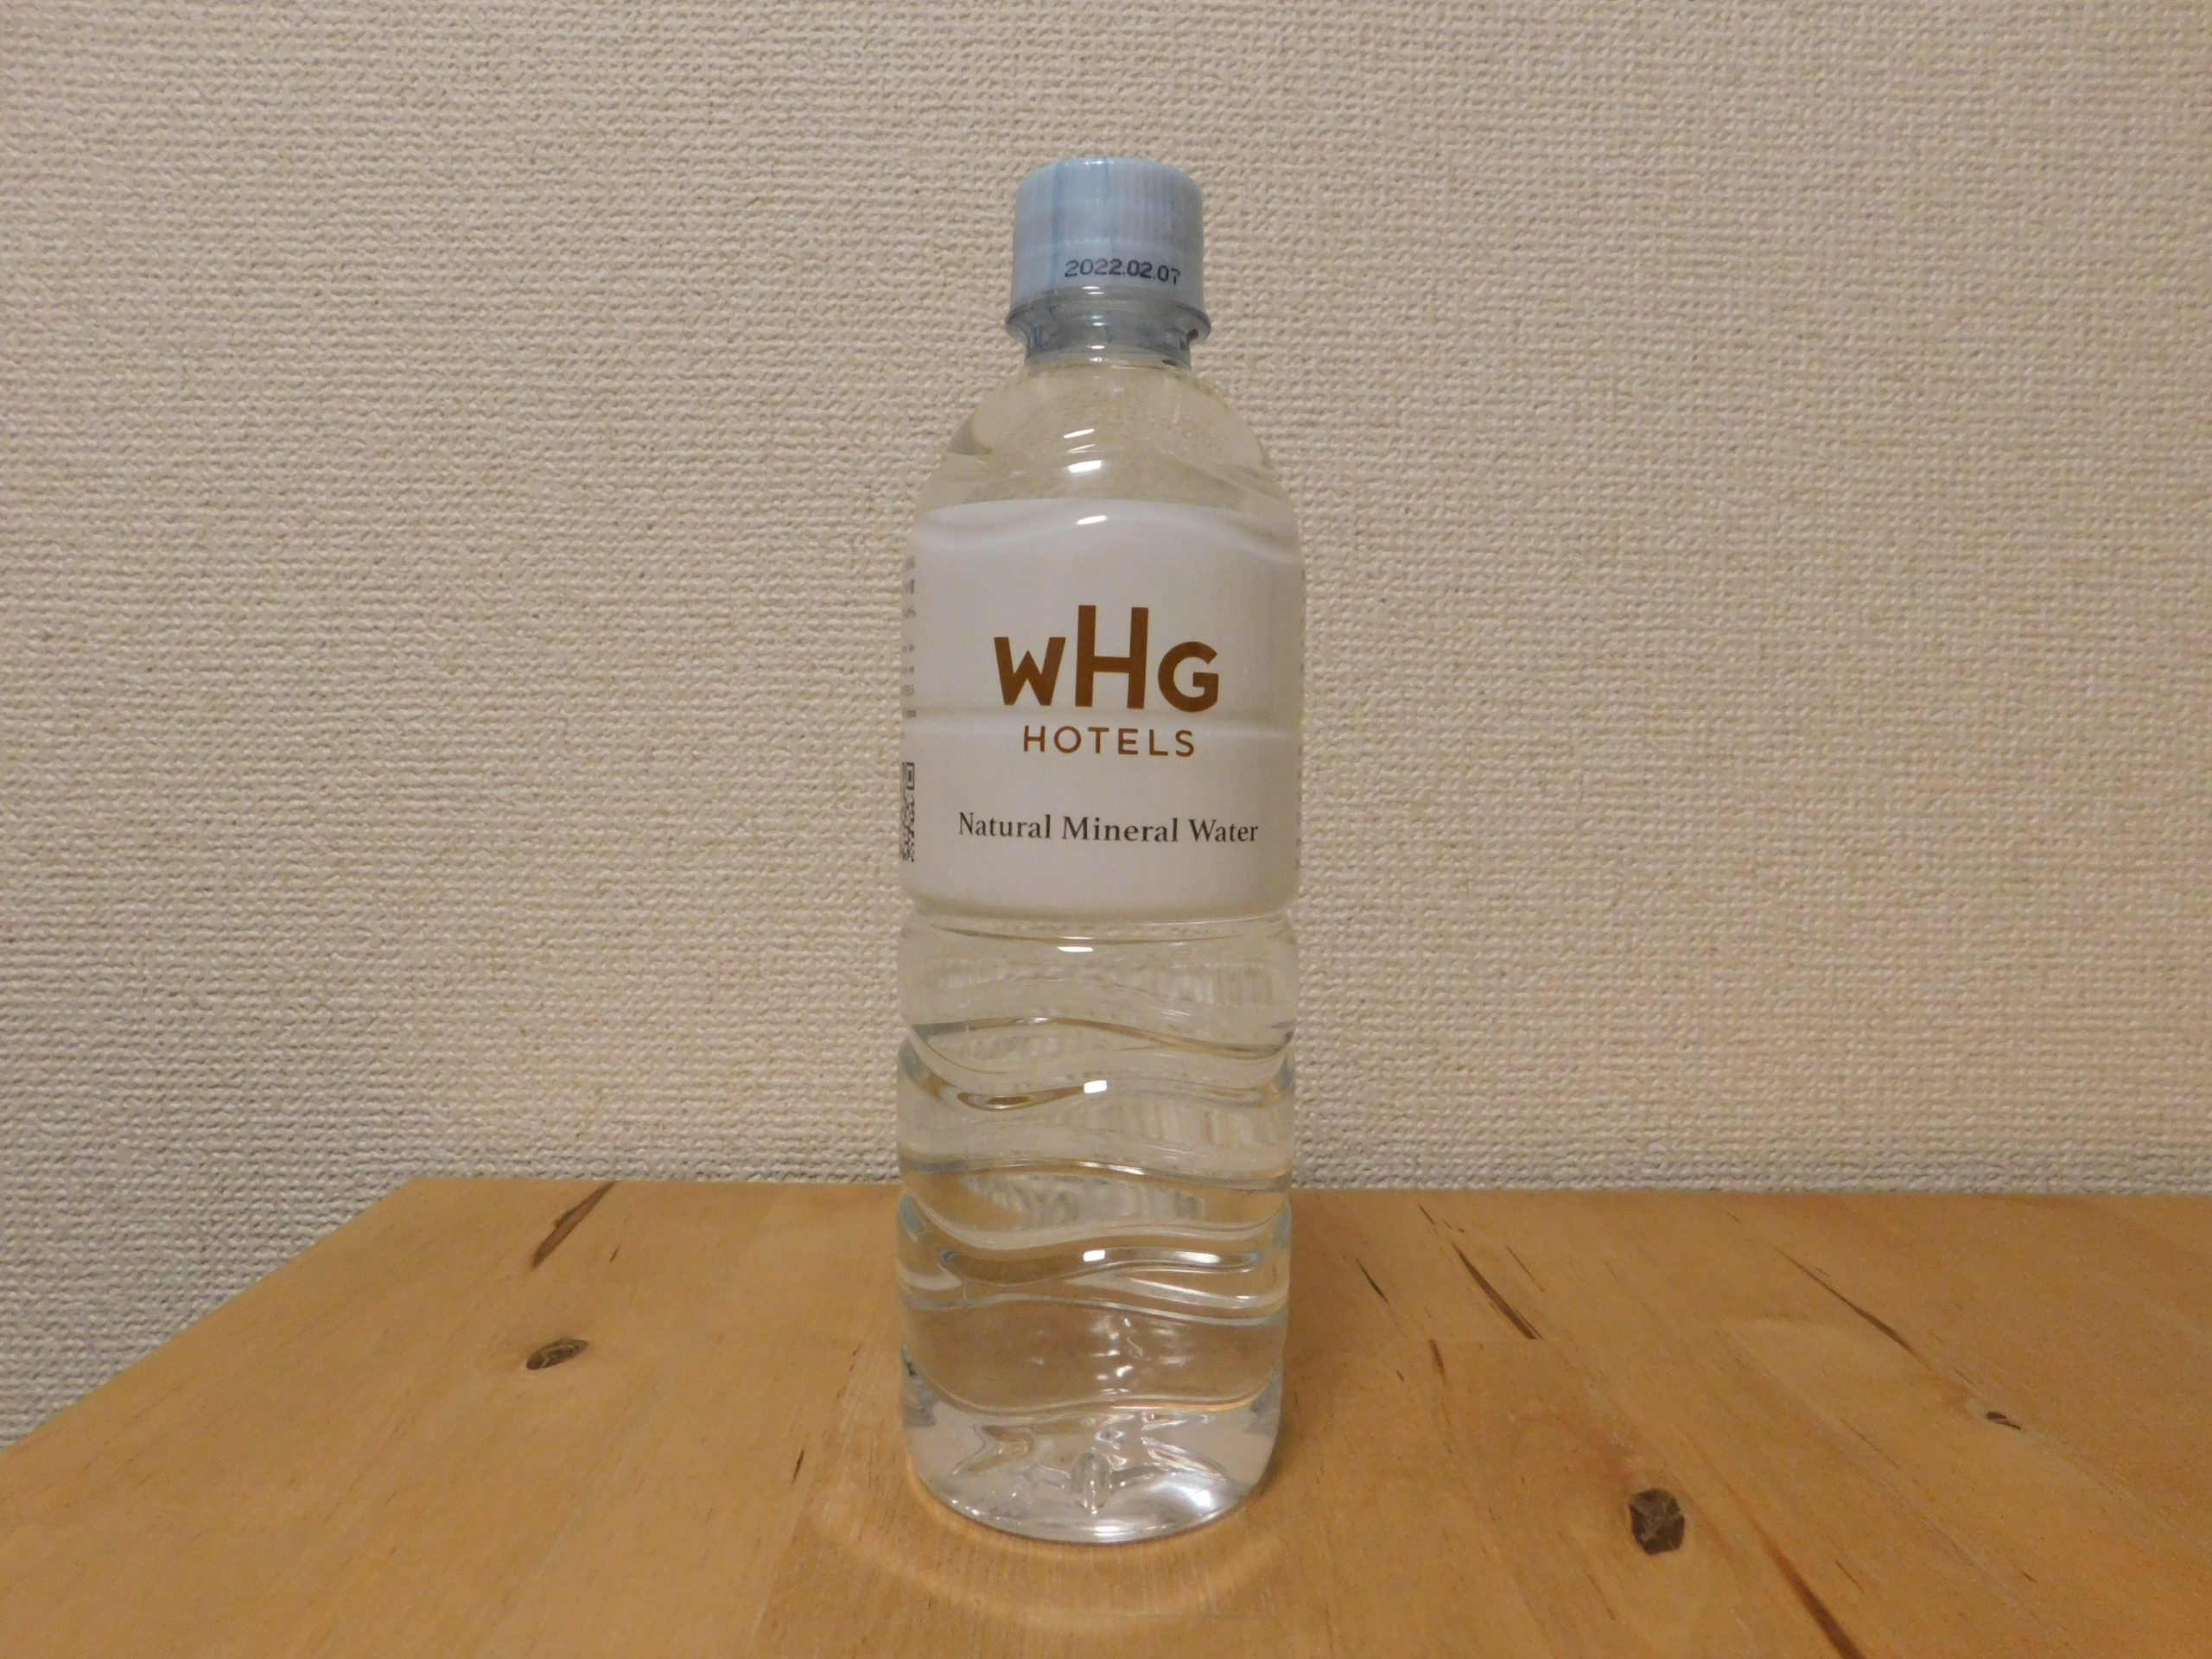 WHGHOTELS ホテル ミネラルウォーター 山中湖村